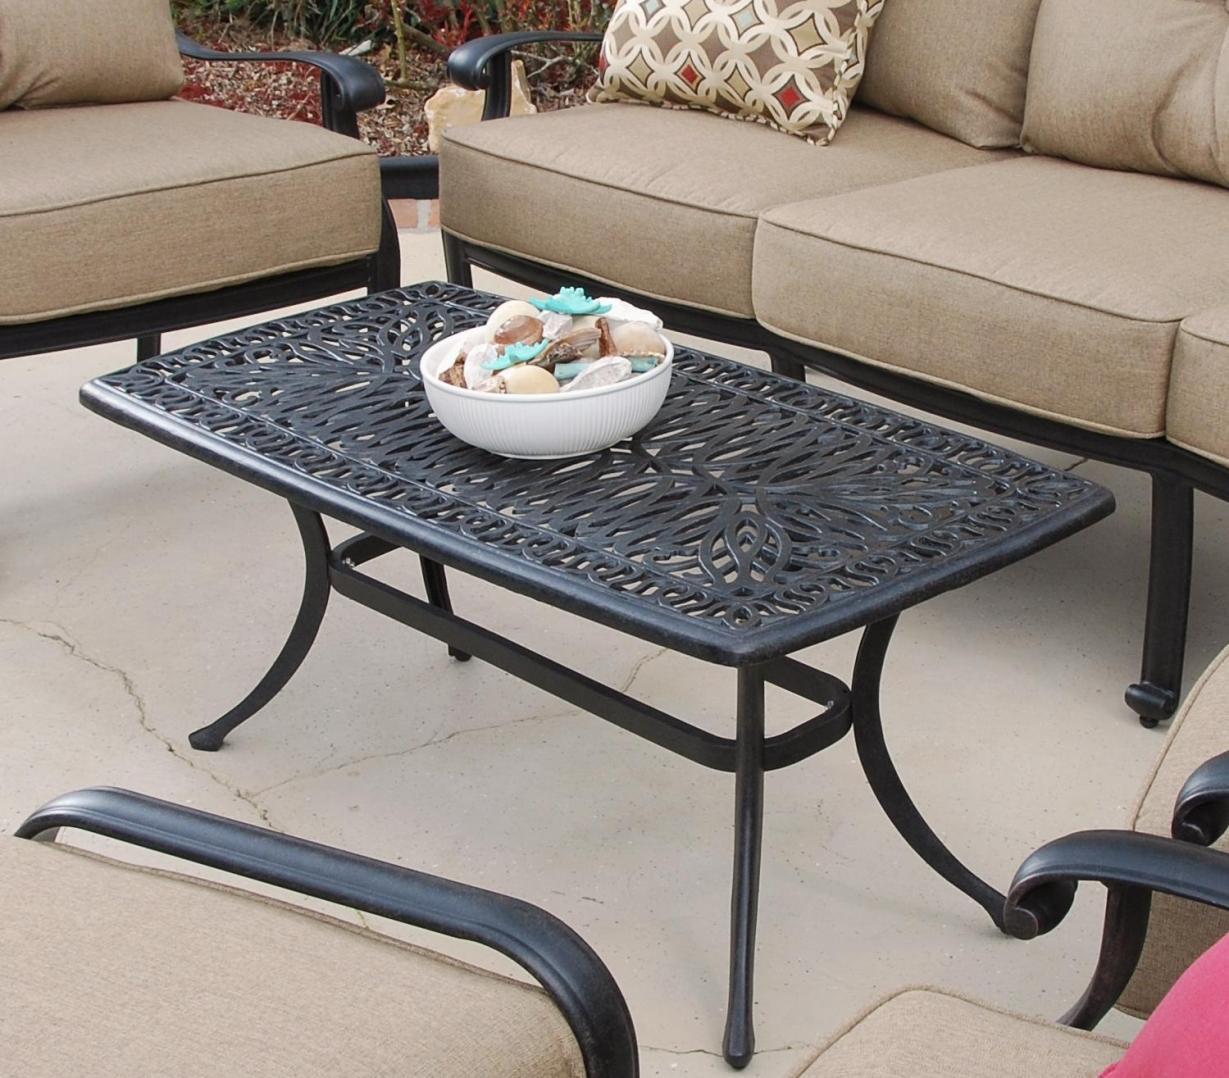 Gray Umbrella Hole Patio Coffee Table Cover Coffee Tables Outdoors Patio Coffee Table houzz-02 Patio Coffee Table